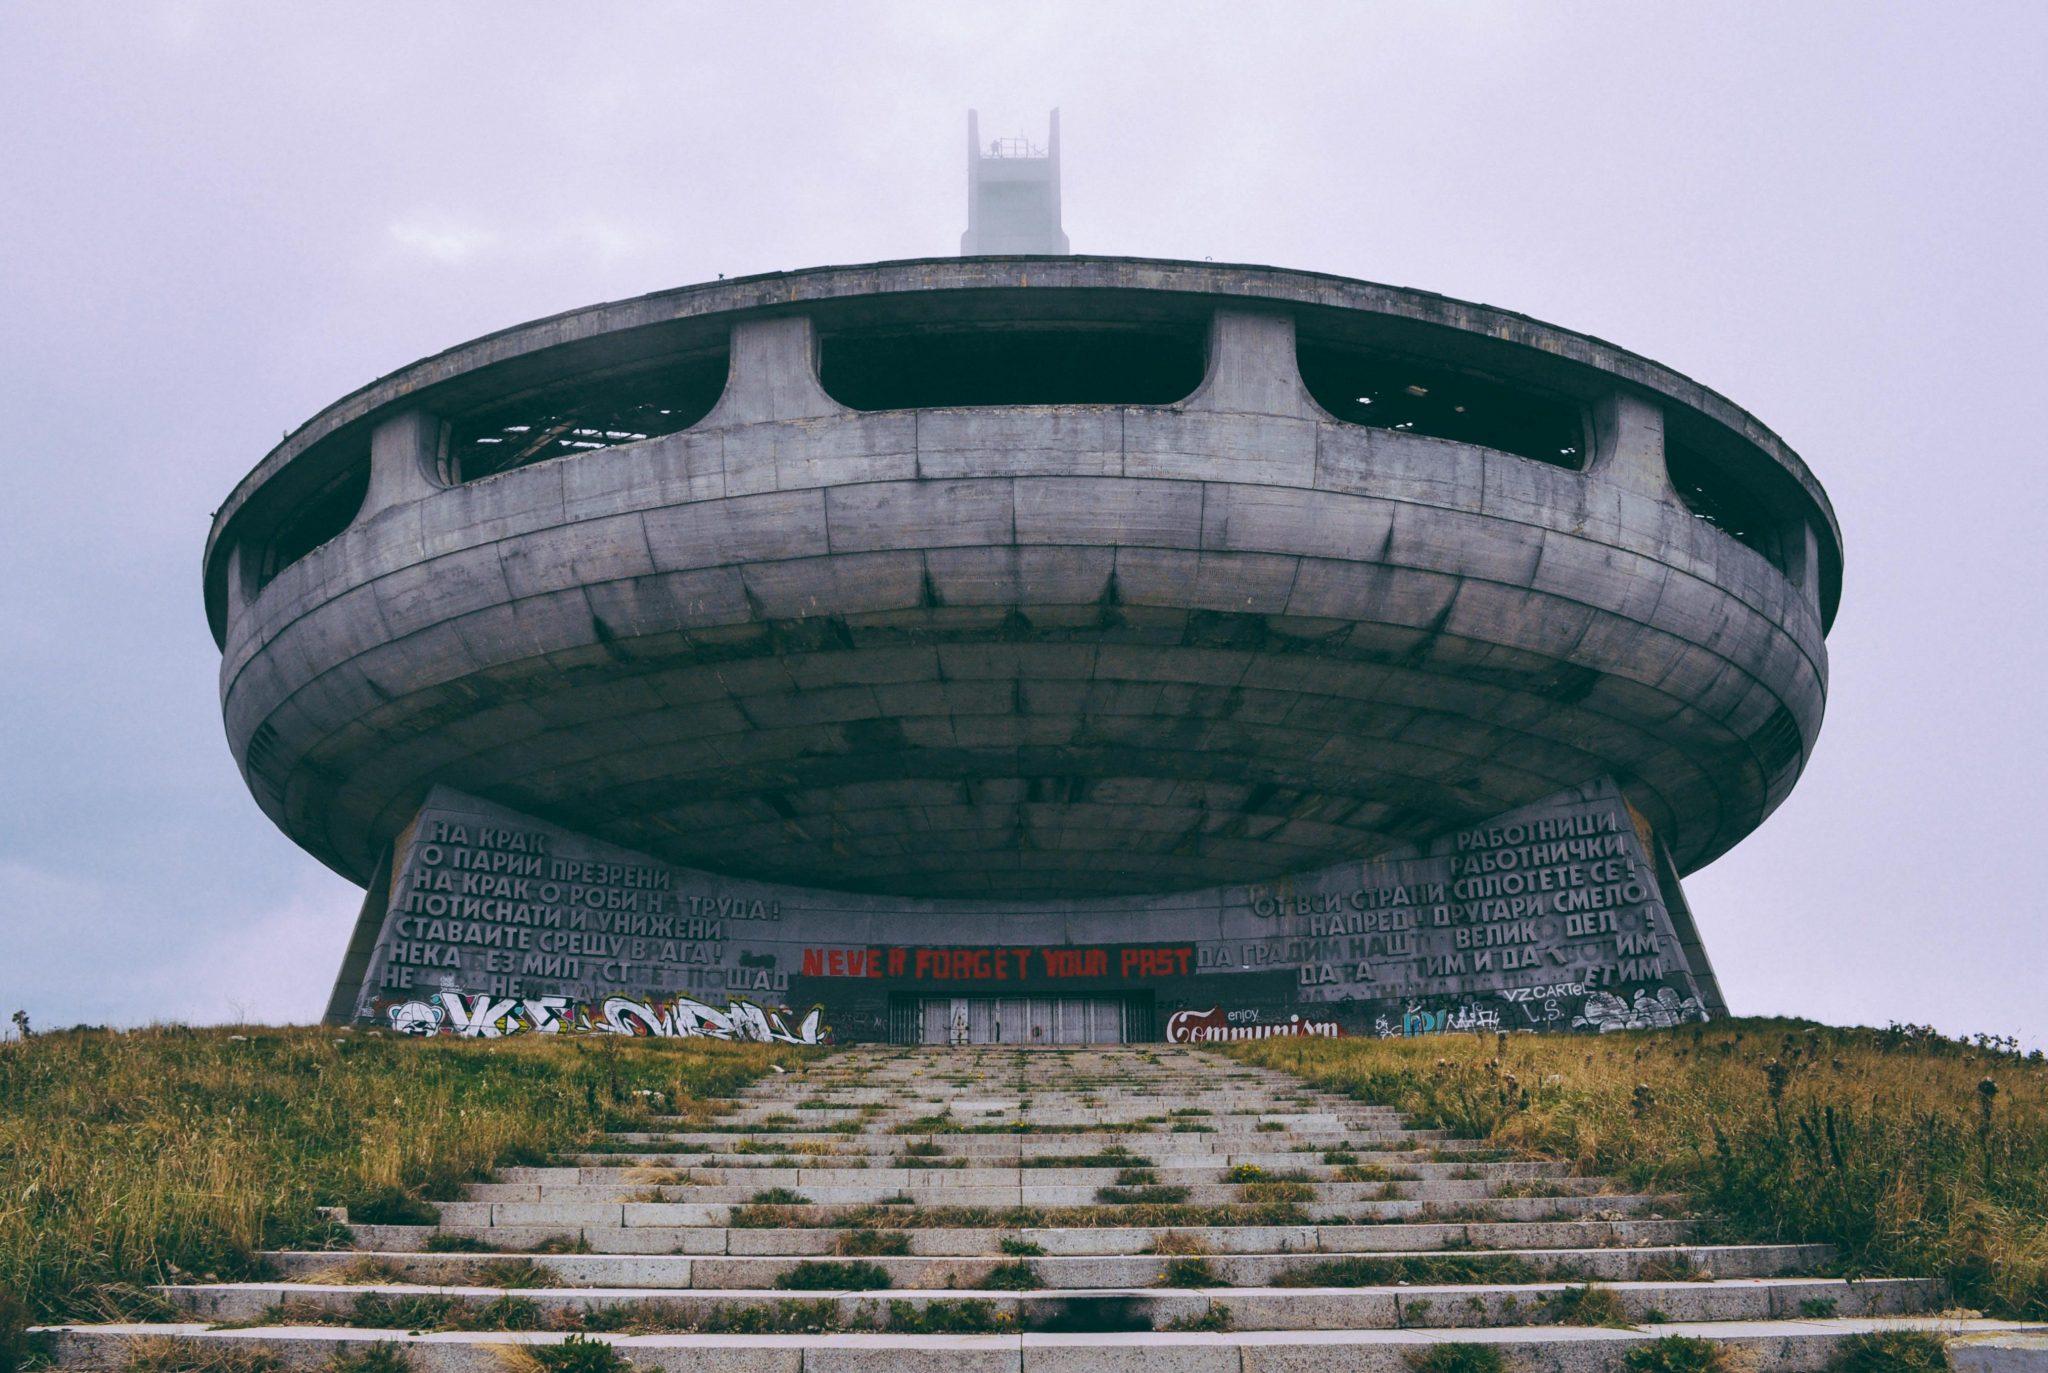 Increadable abandoned communist building of gargantuan proportions near Veliko Tarnovo